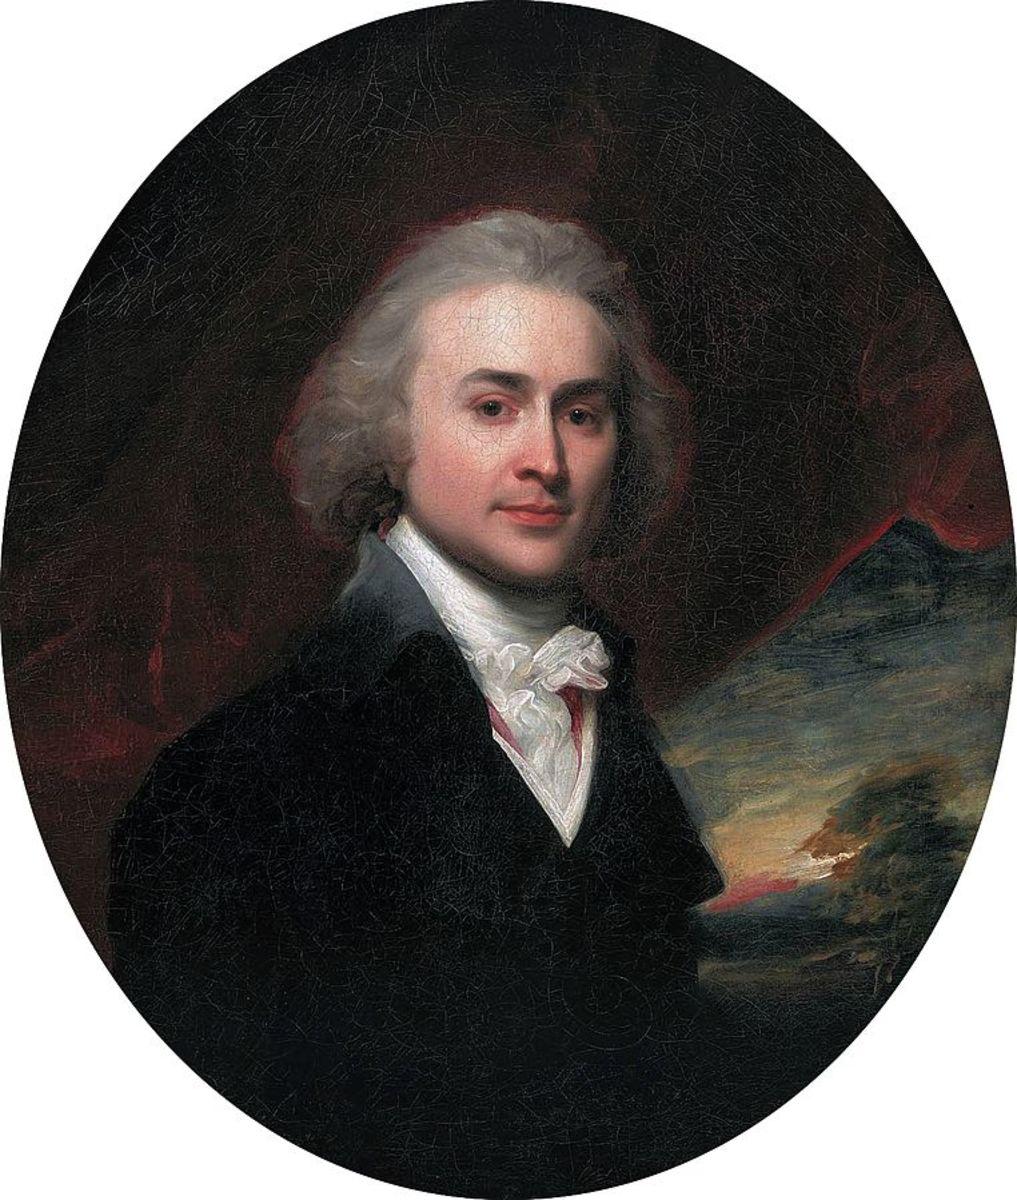 John Quincy Adams at age 28.